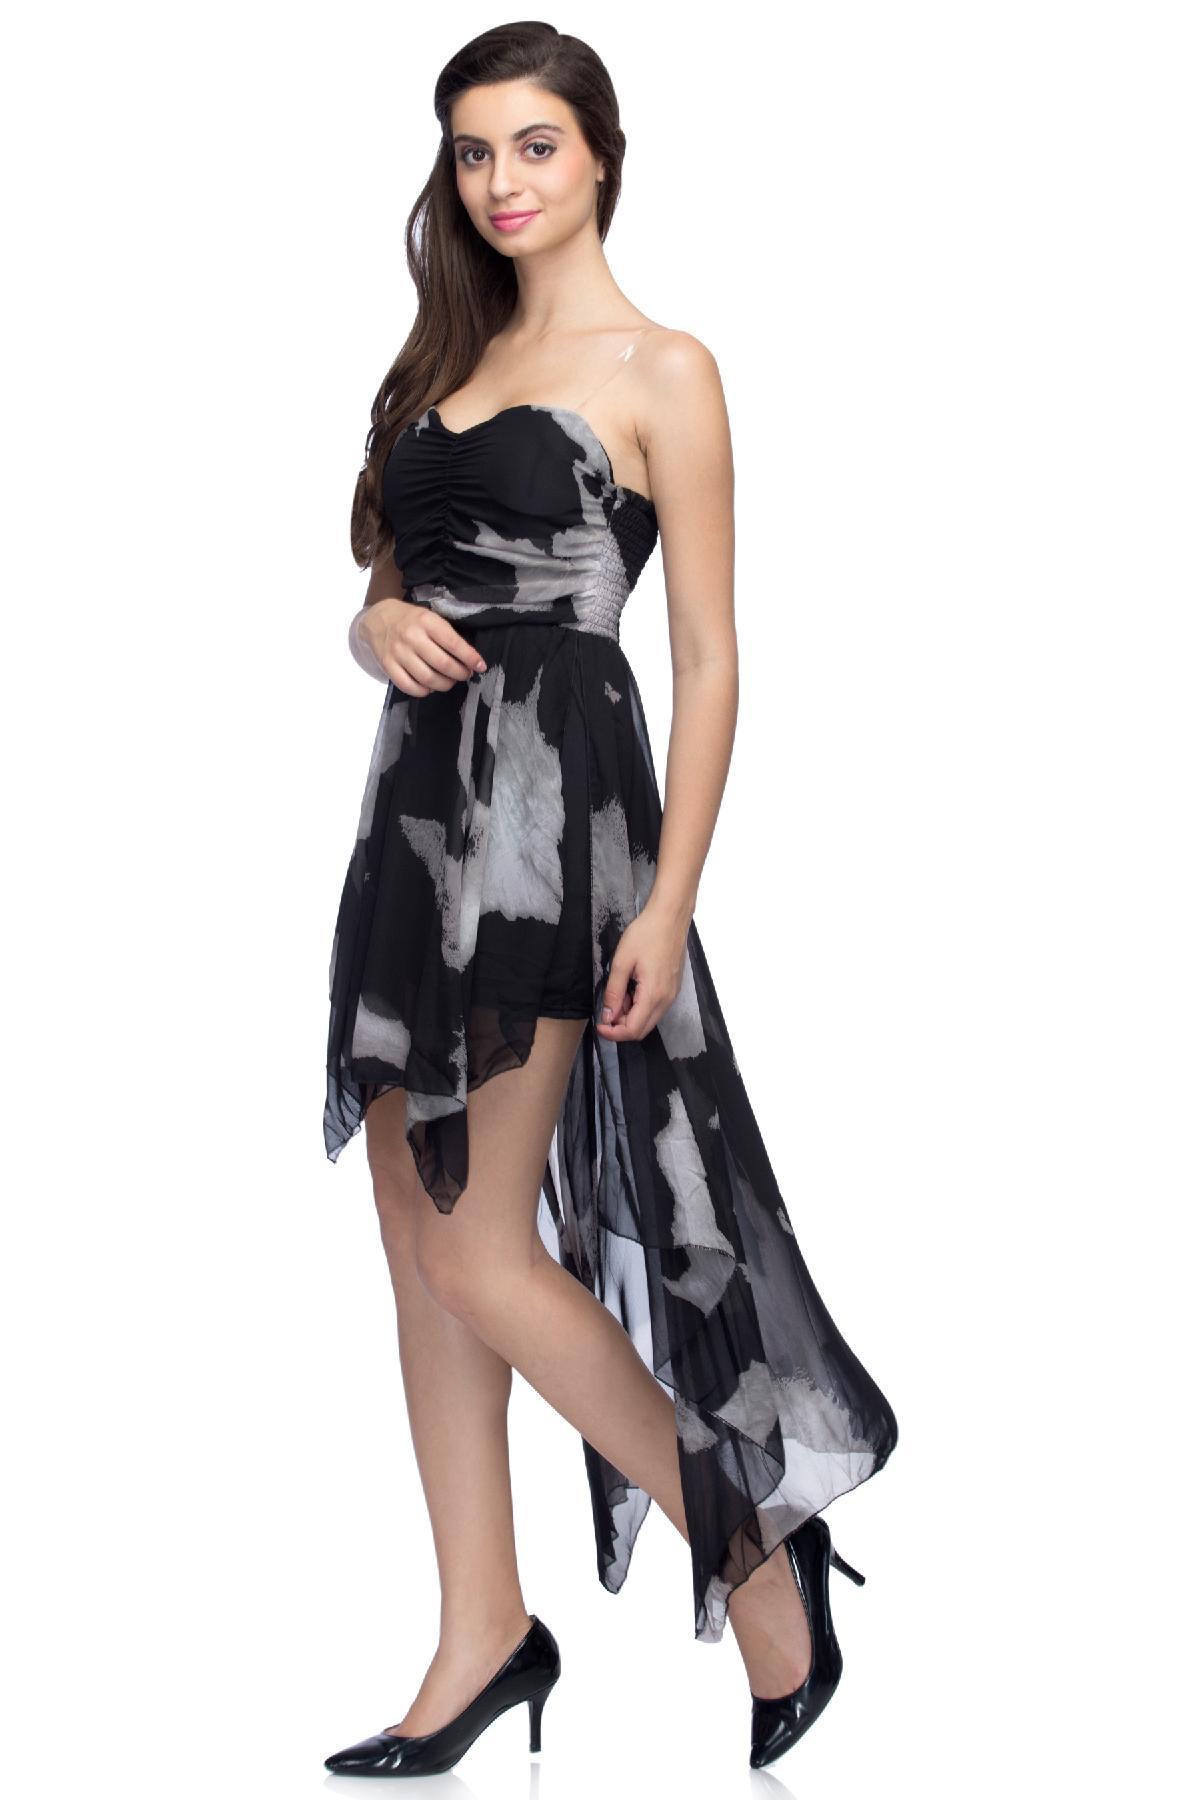 5f231d9cd27 ... rent RIB clothing Diva Tube Dress Black   White dress for ...